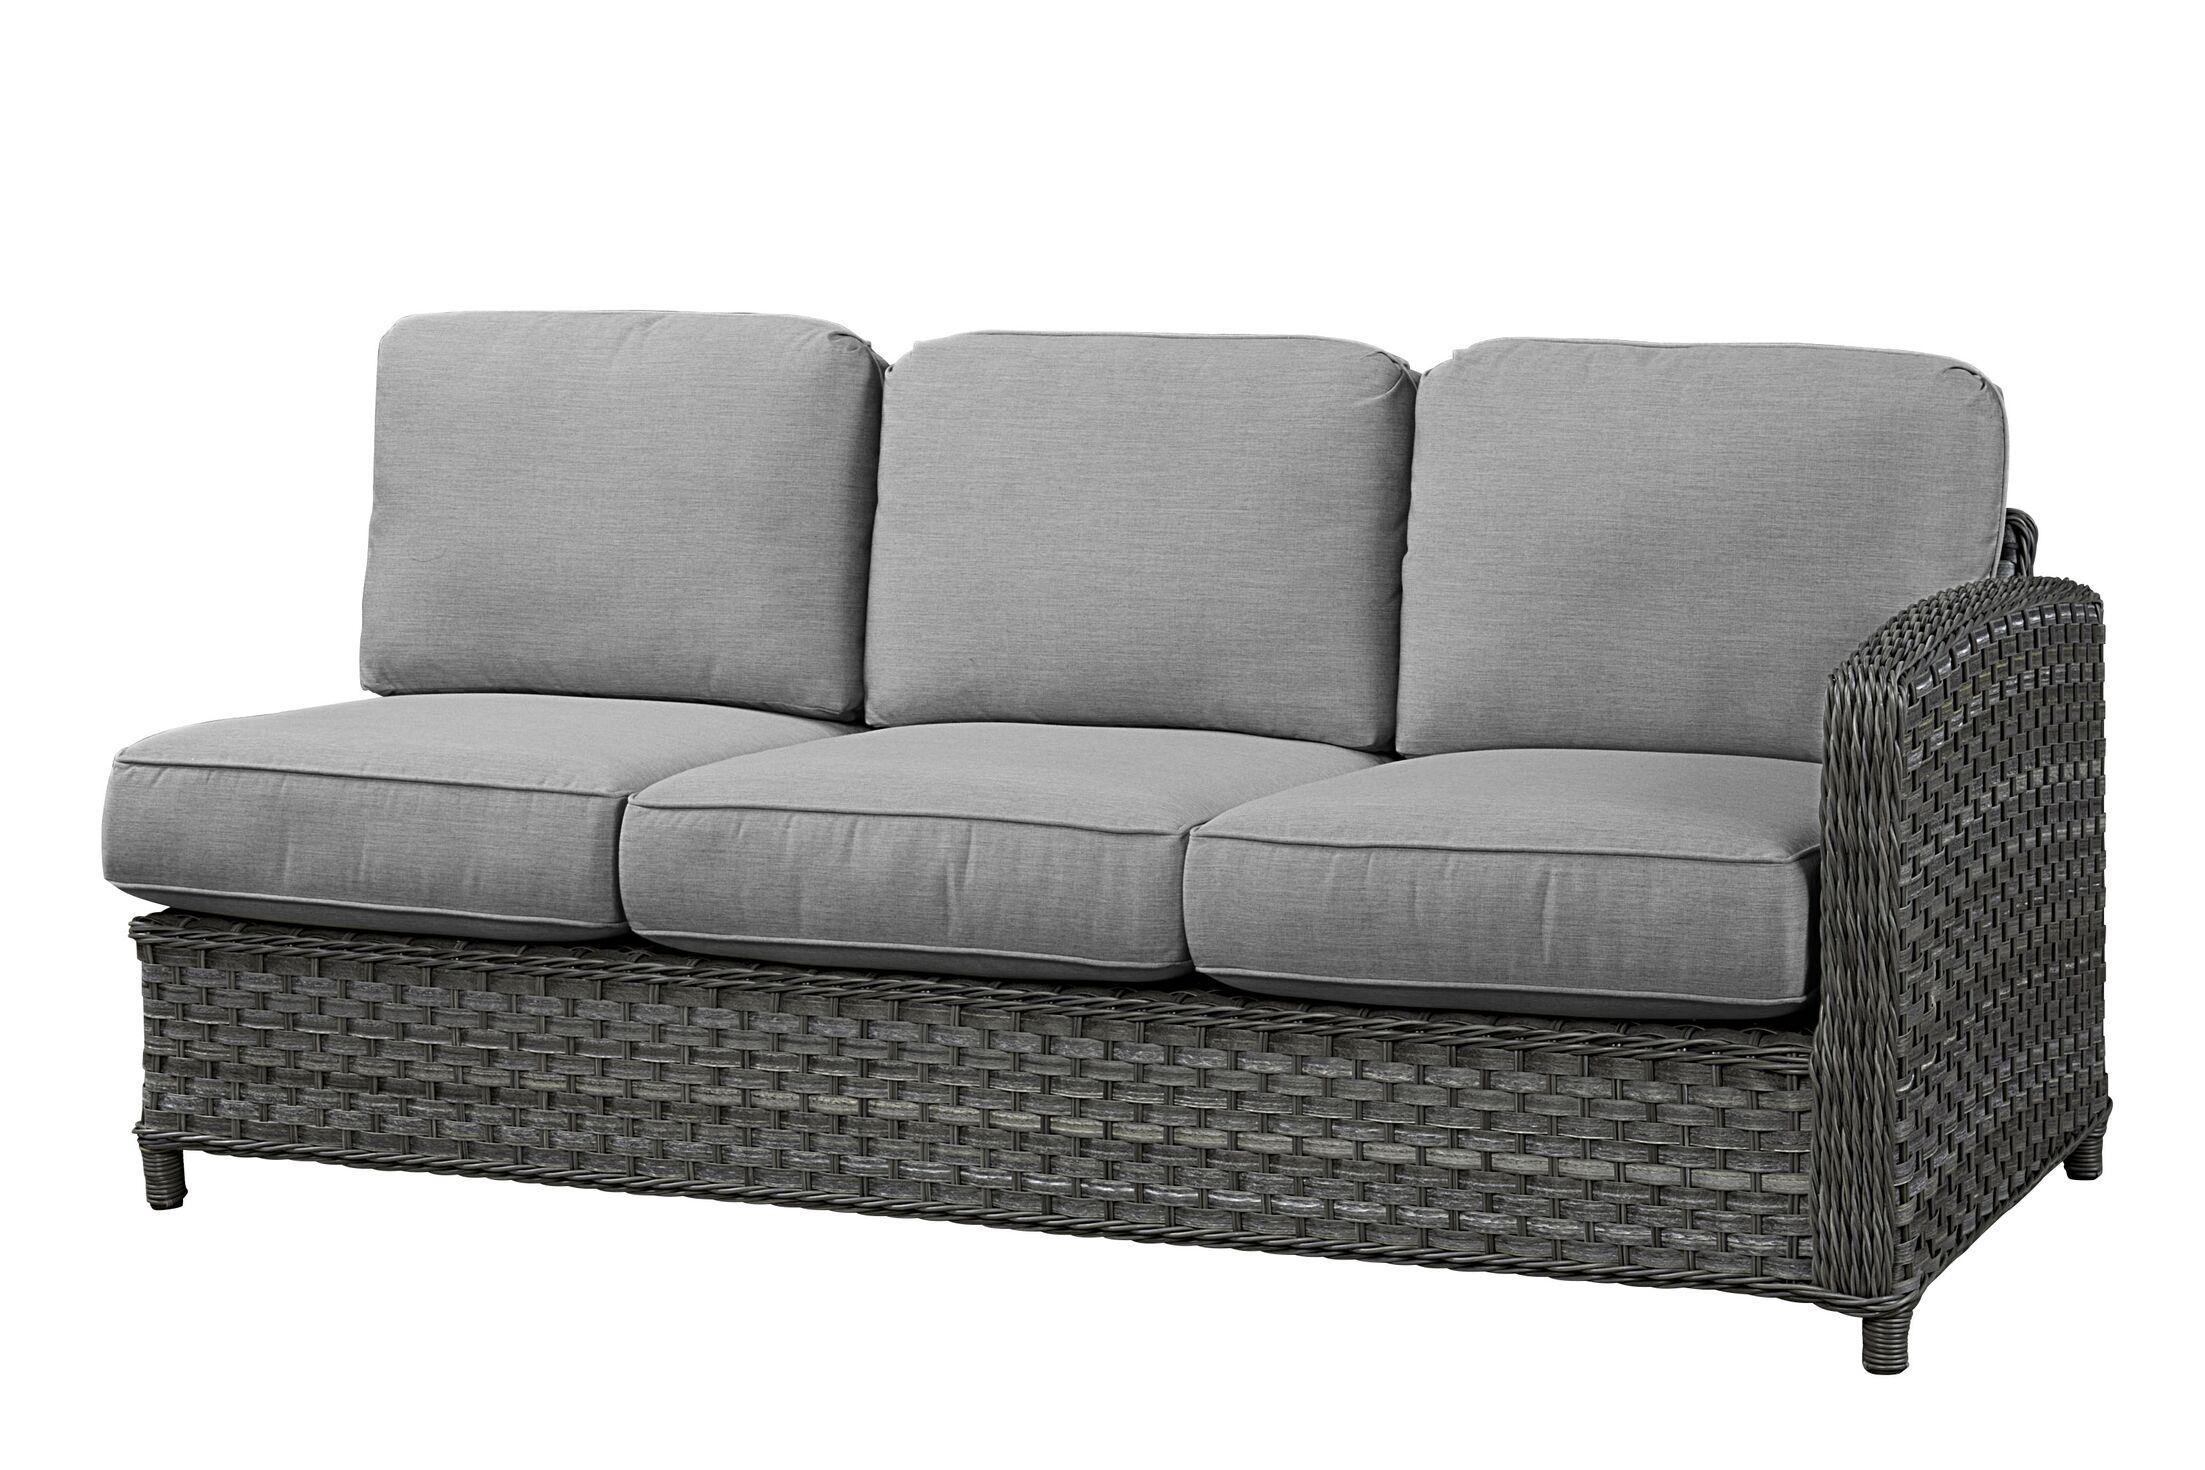 Sofa with Cushion Frame Finish: Grey, Fabric: Canvas Air Blue